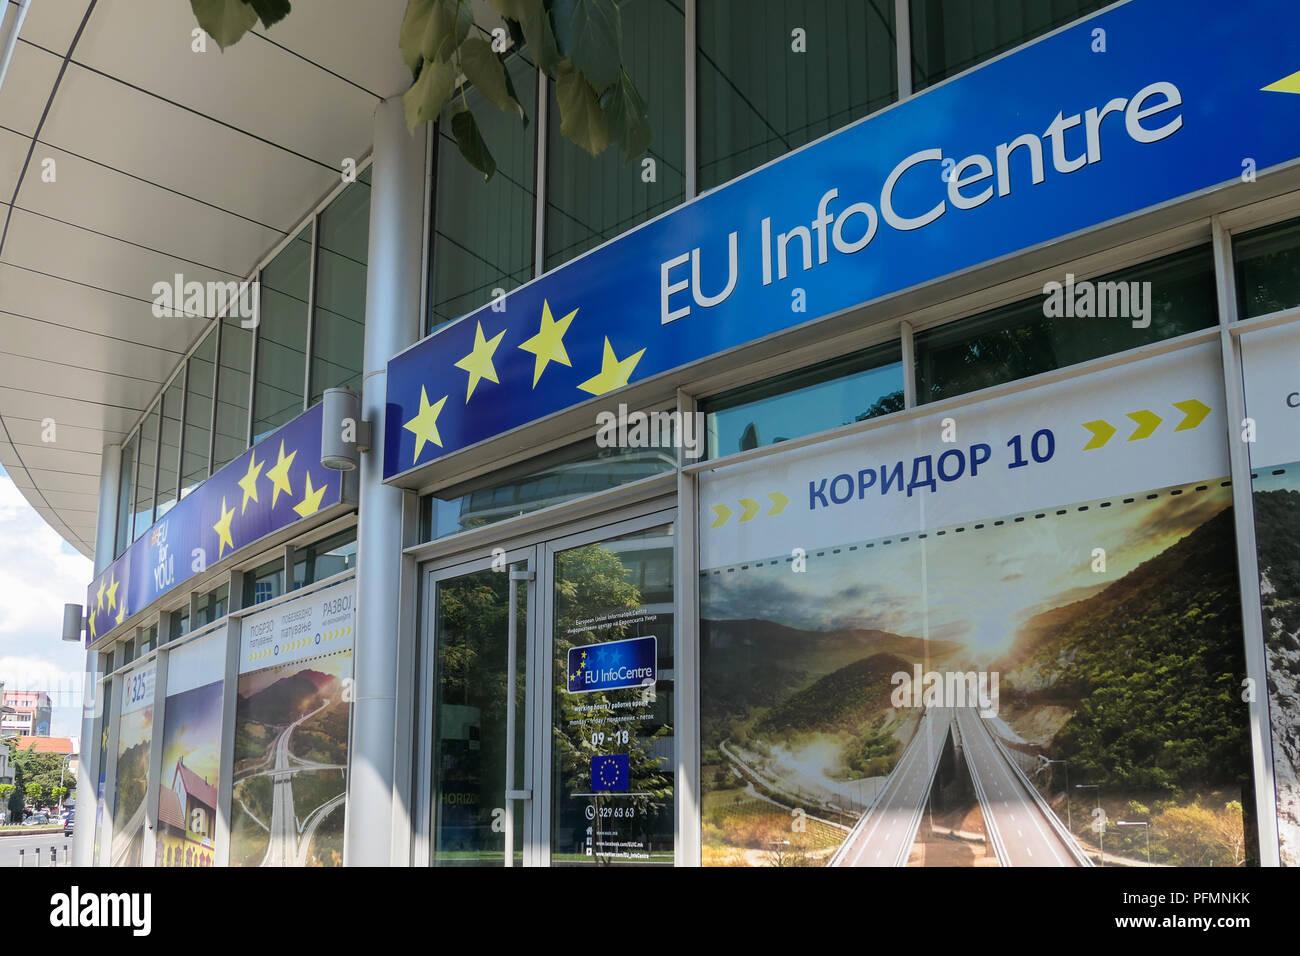 EU Info Center, Skopje, Macedonia Immagini Stock